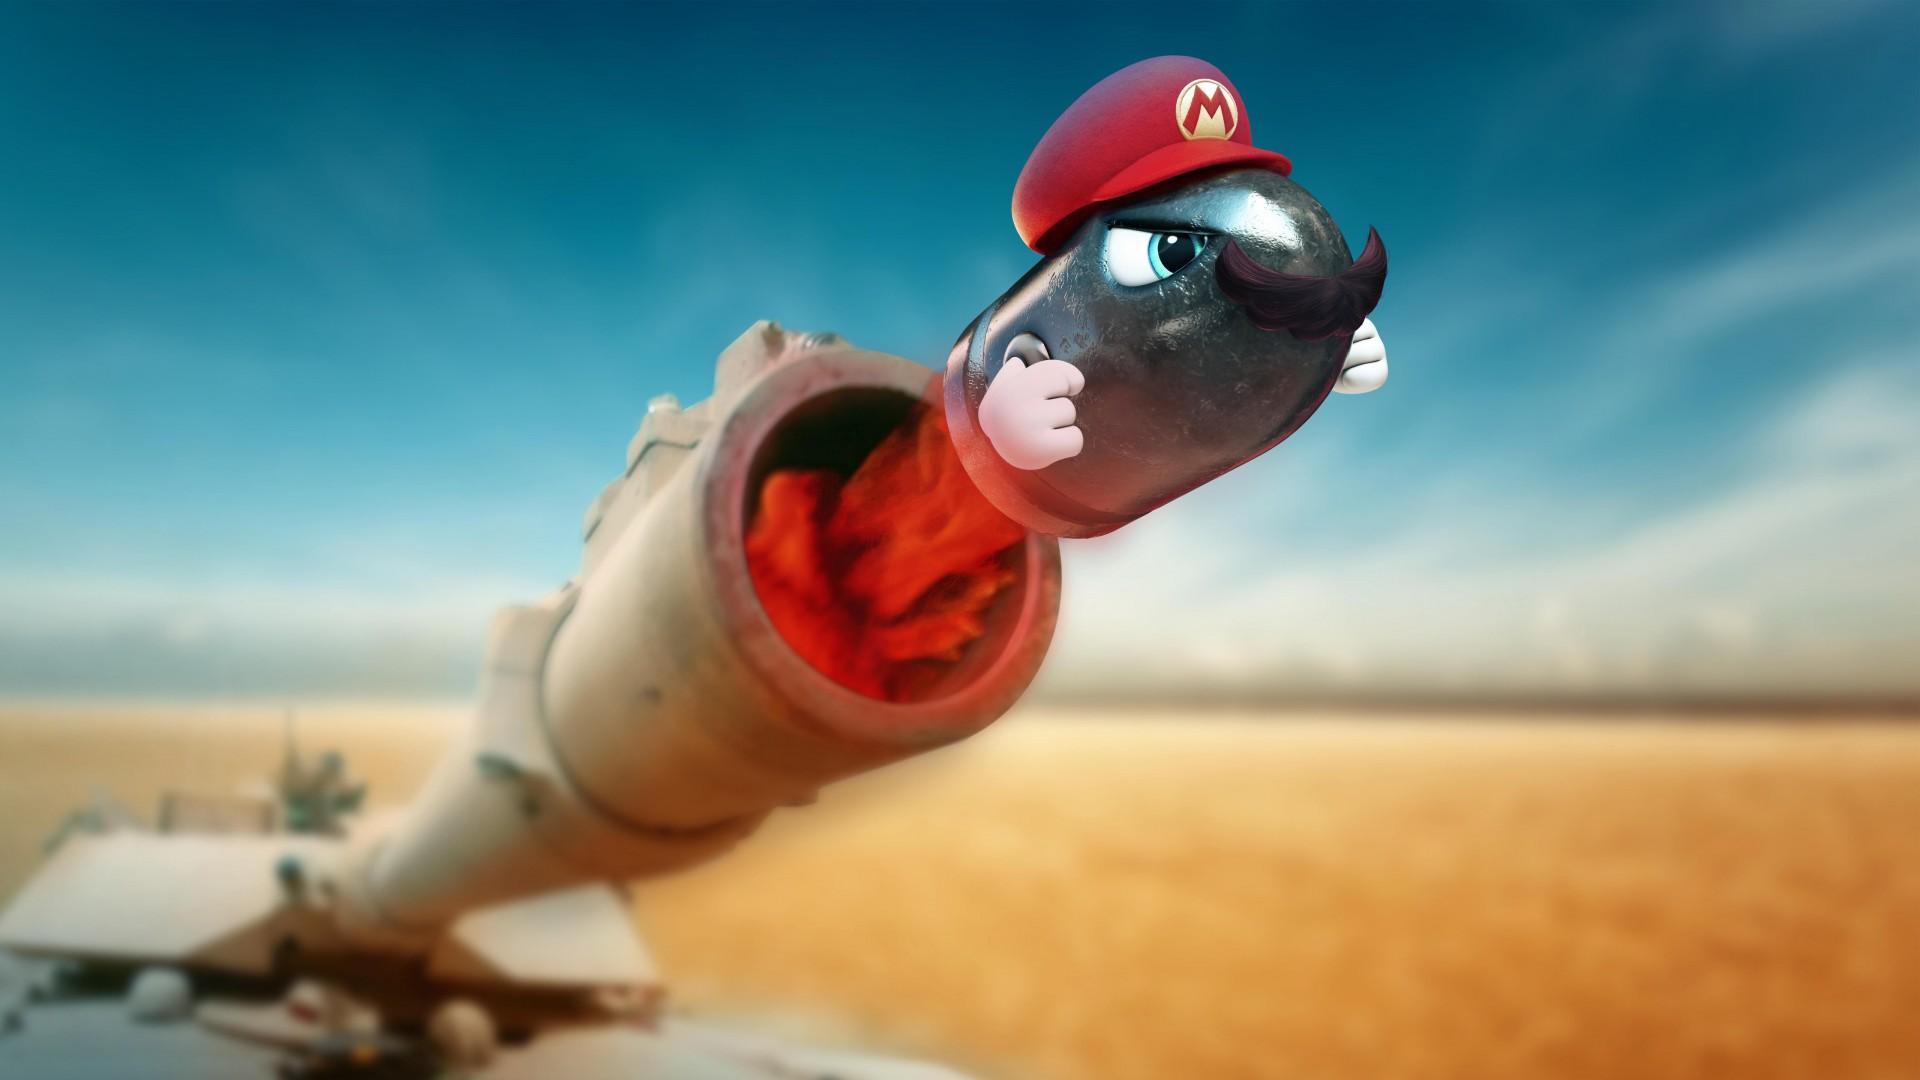 Super Mario Odyssey Wallpaper Iphone X Super Mario Odyssey Tank 4k Wallpapers Hd Wallpapers